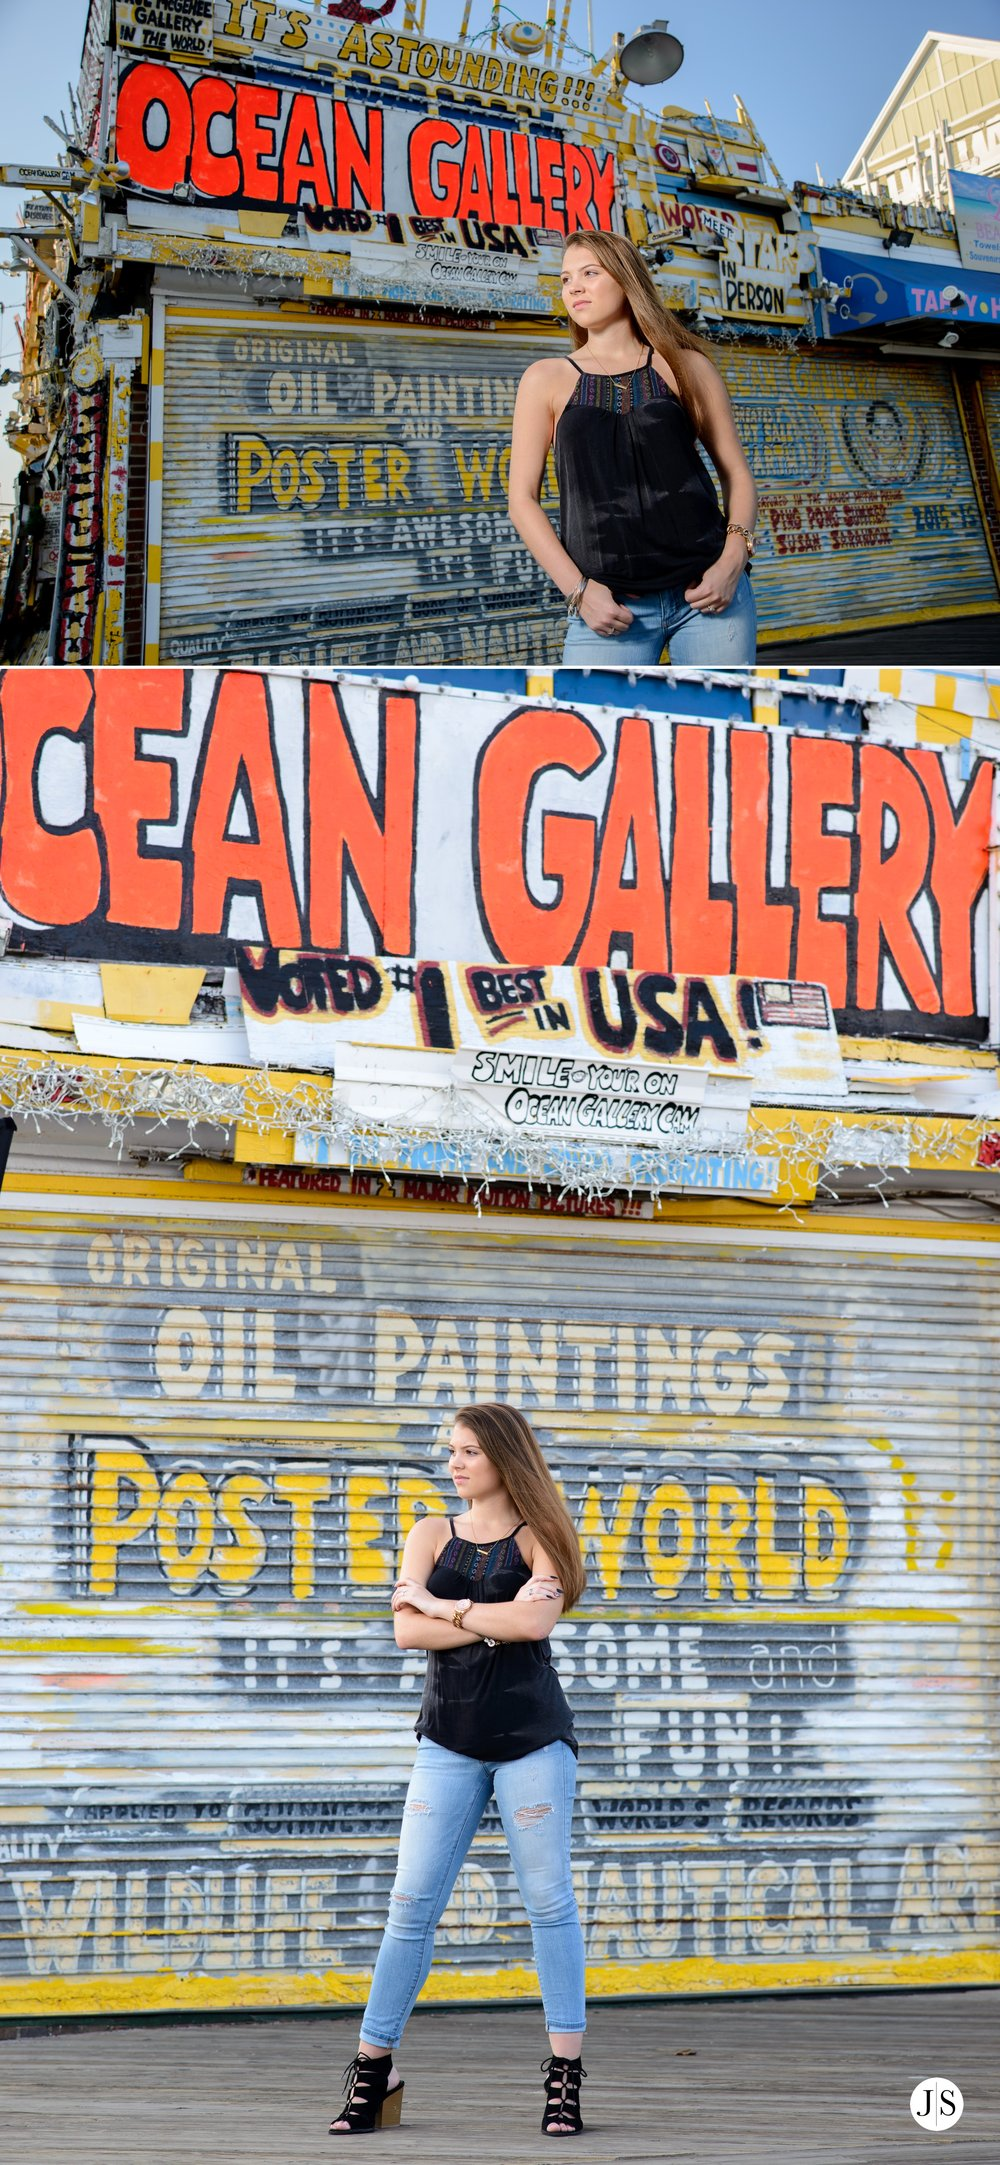 senior-portrait-oceancity-maryland-portraits-boardwalk-artgallery-photo 4.jpg